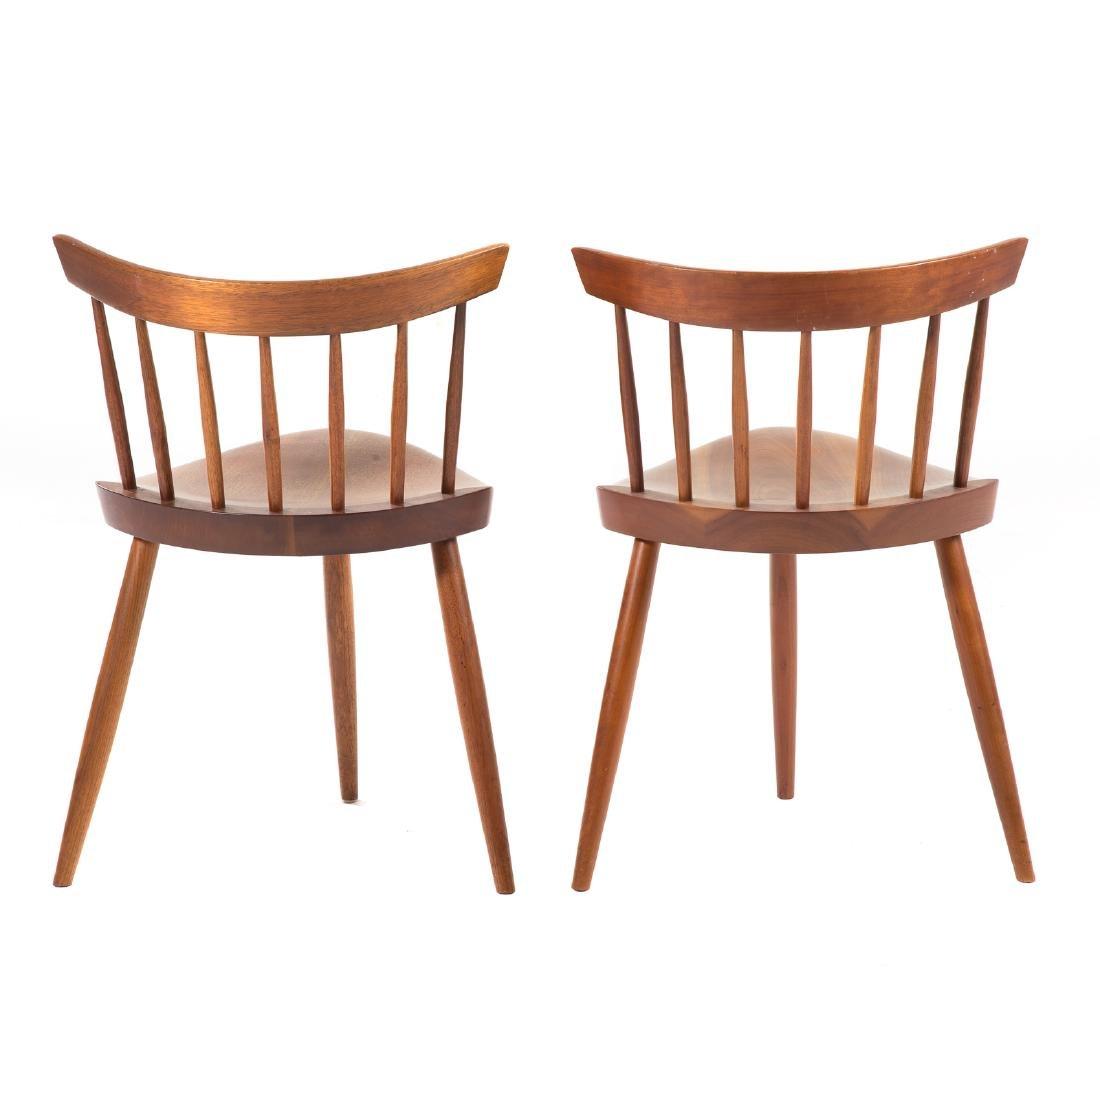 Two George Nakashima Mira Chairs - 3